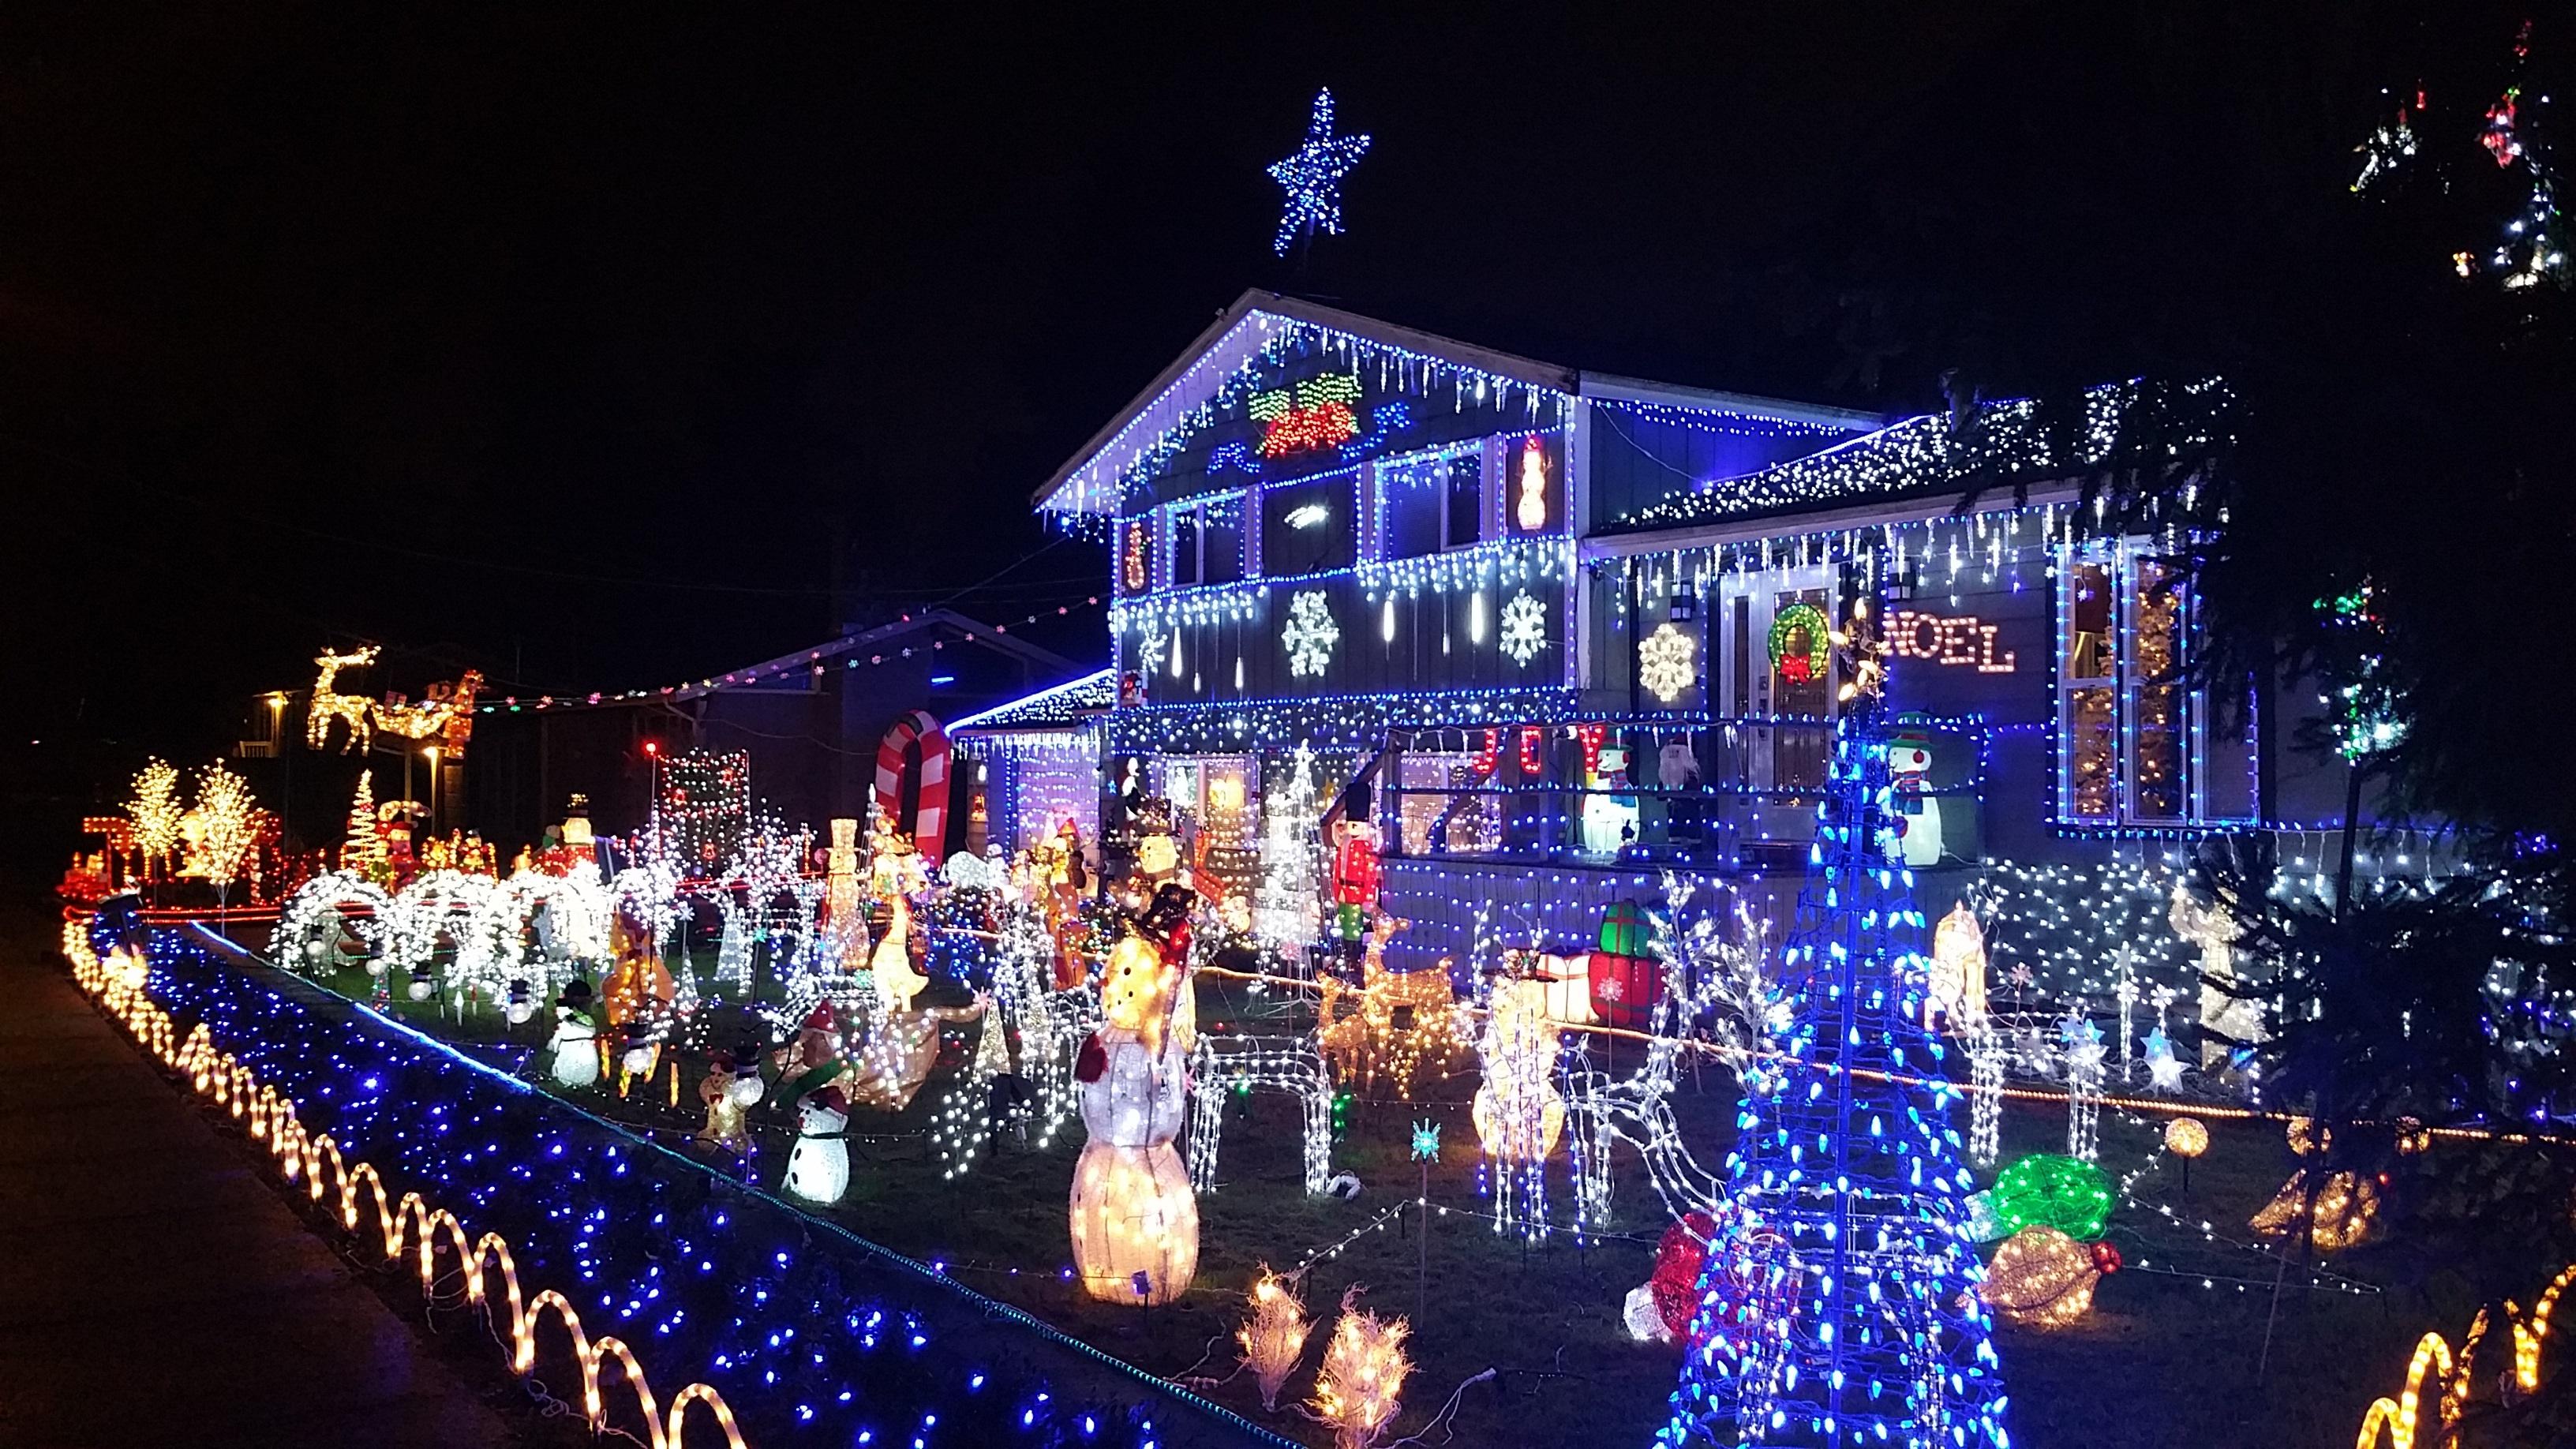 NEWS 1130's 2016 Christmas Lights and Events Spotter - NEWS 1130